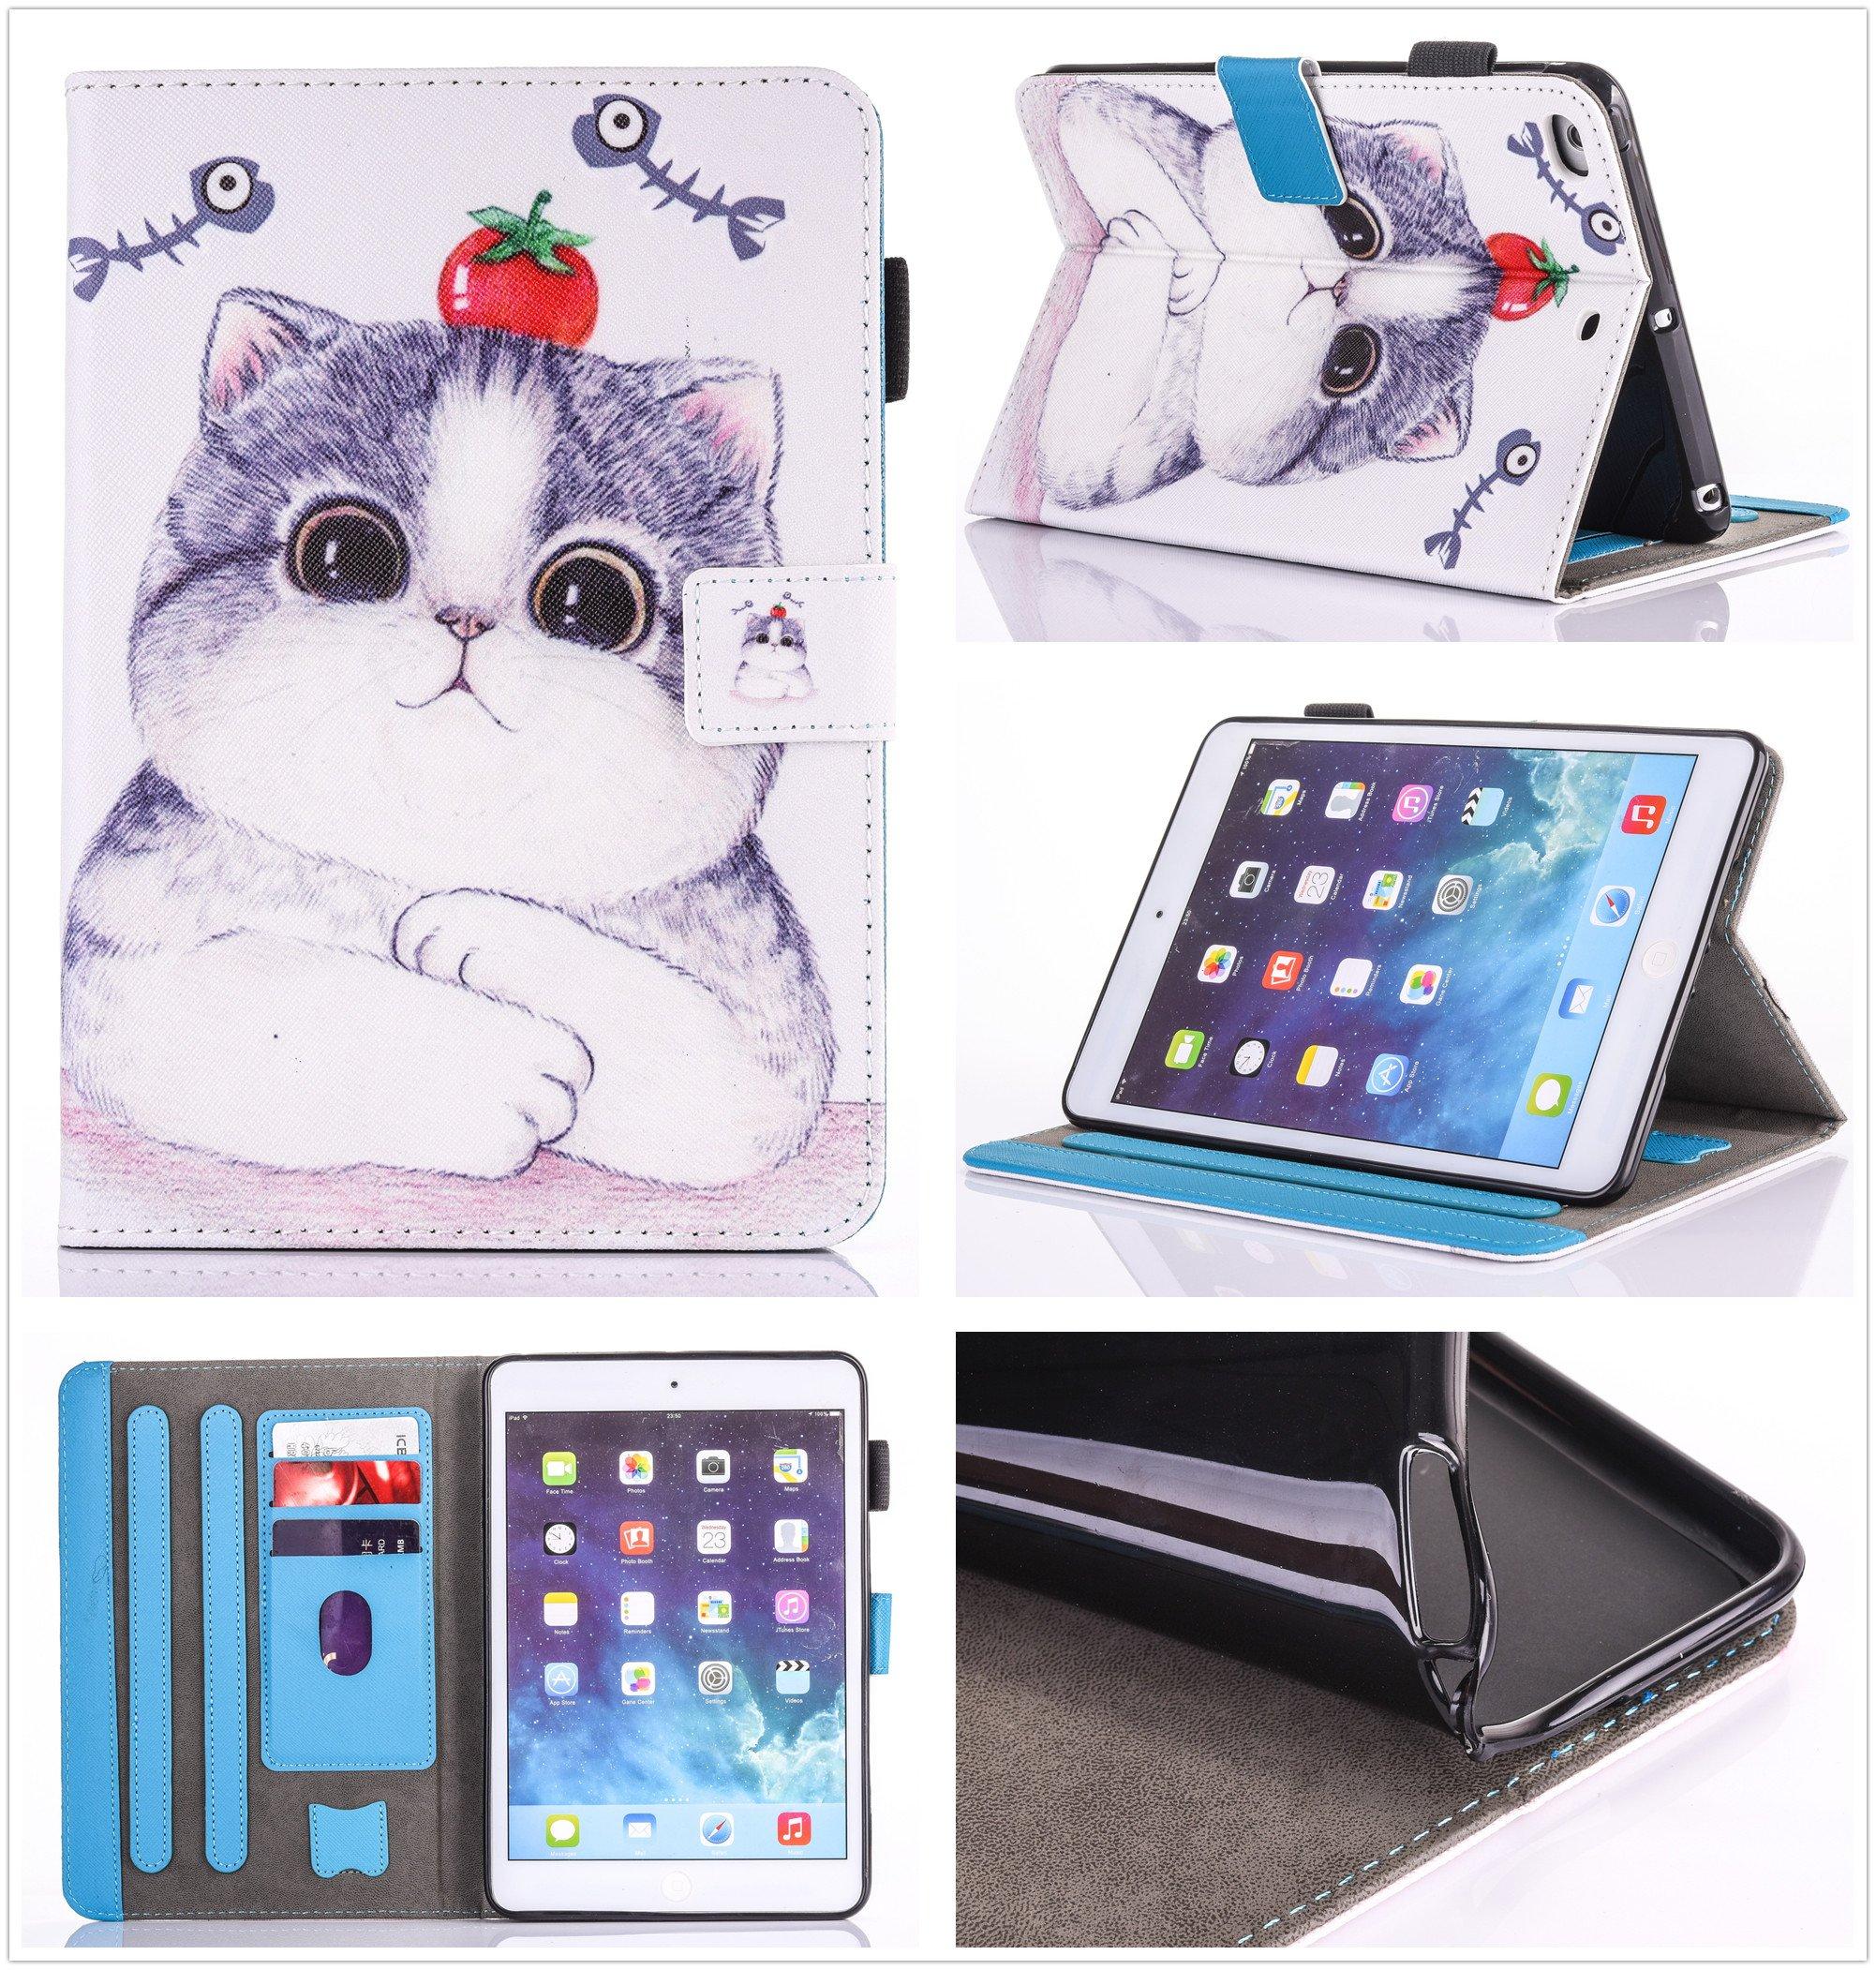 iPad Air 2/iPad Air/iPad 9.7 inch 2017 Case, PU Leather Folio [Anti-Slip] Cover with [Magnetic Closure] [Cards Slots] Auto Sleep/Wake for Apple iPad 9.7 2017/iPad Air 1&2 (iPad 5&6), Sketch Cat by Wallace Elec (Image #1)